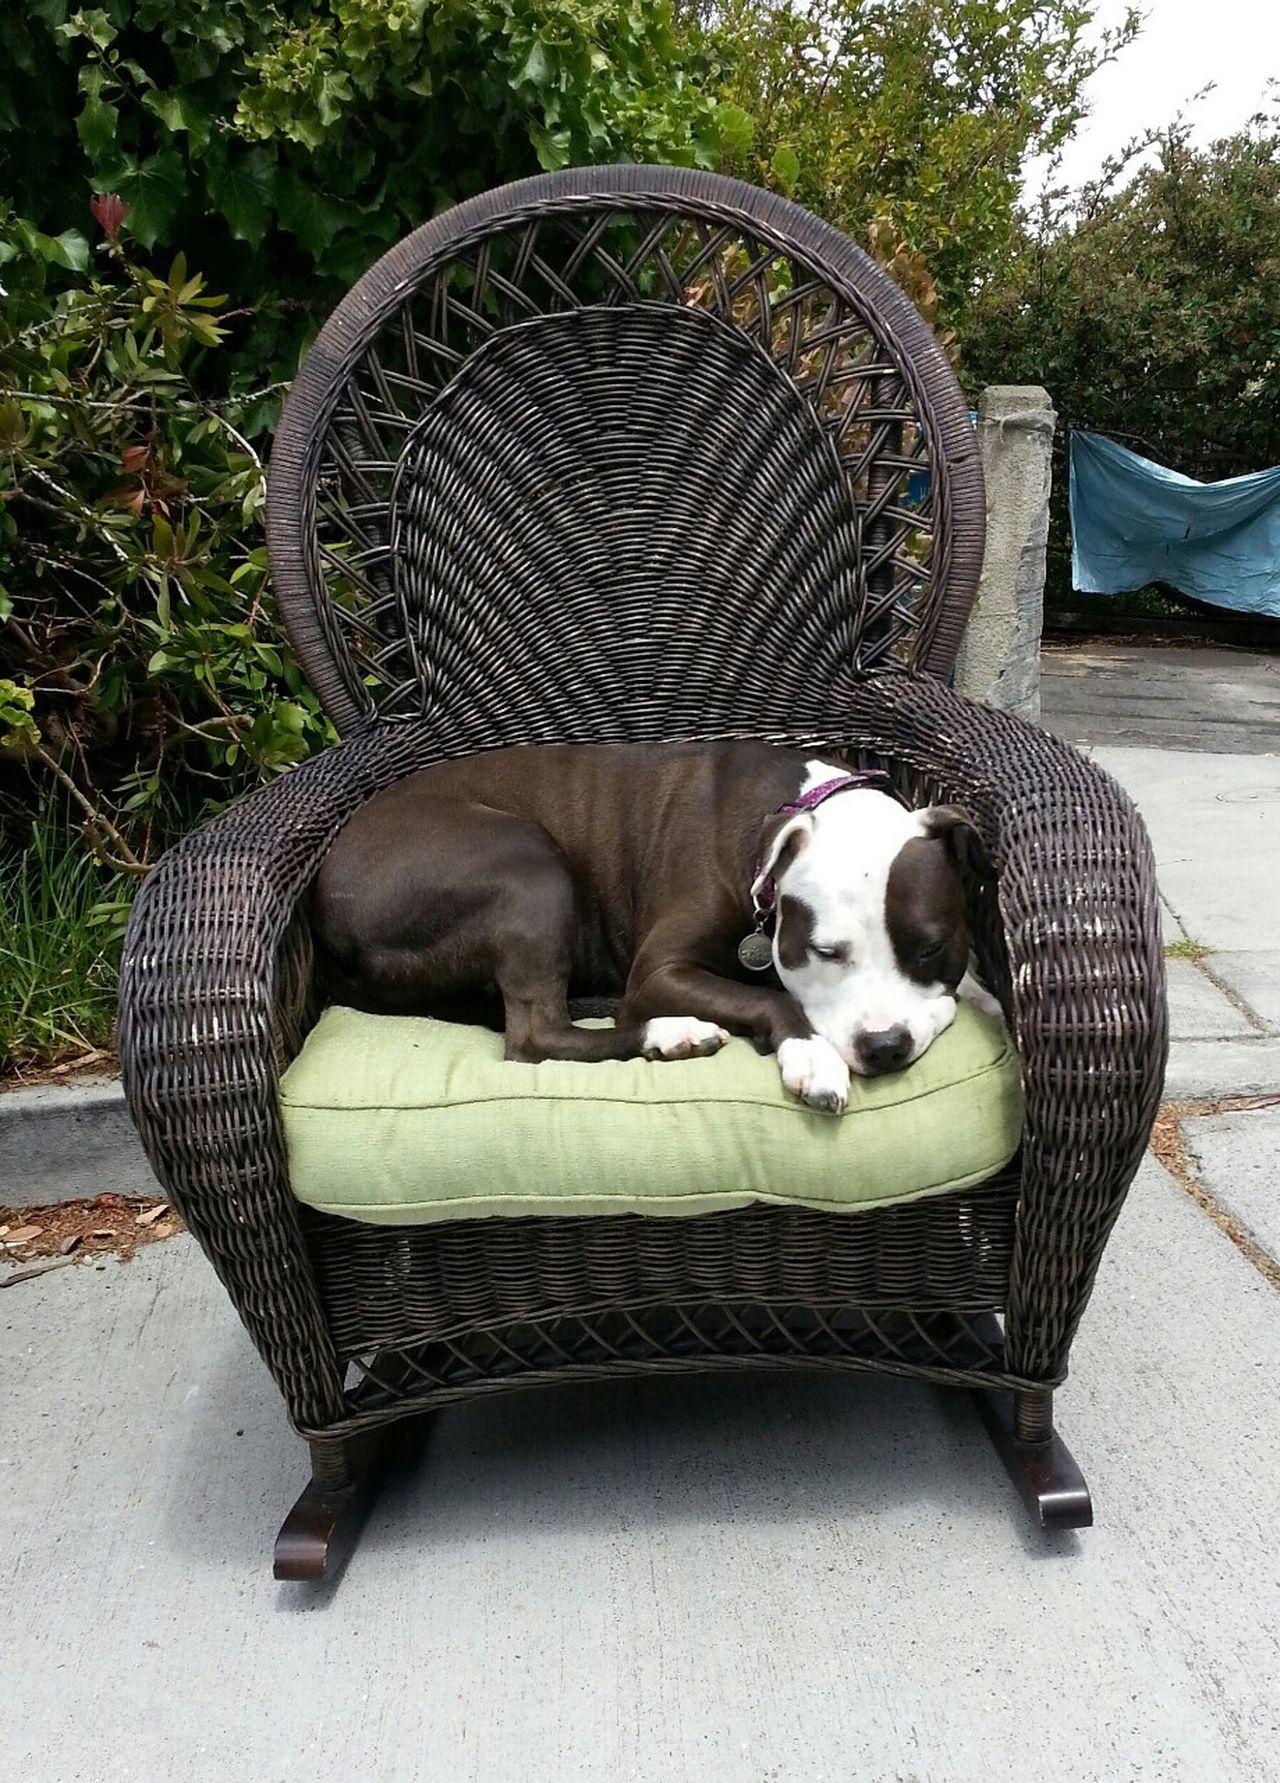 Spoon The Dog Pets Corner Chair Pitbull Staffy